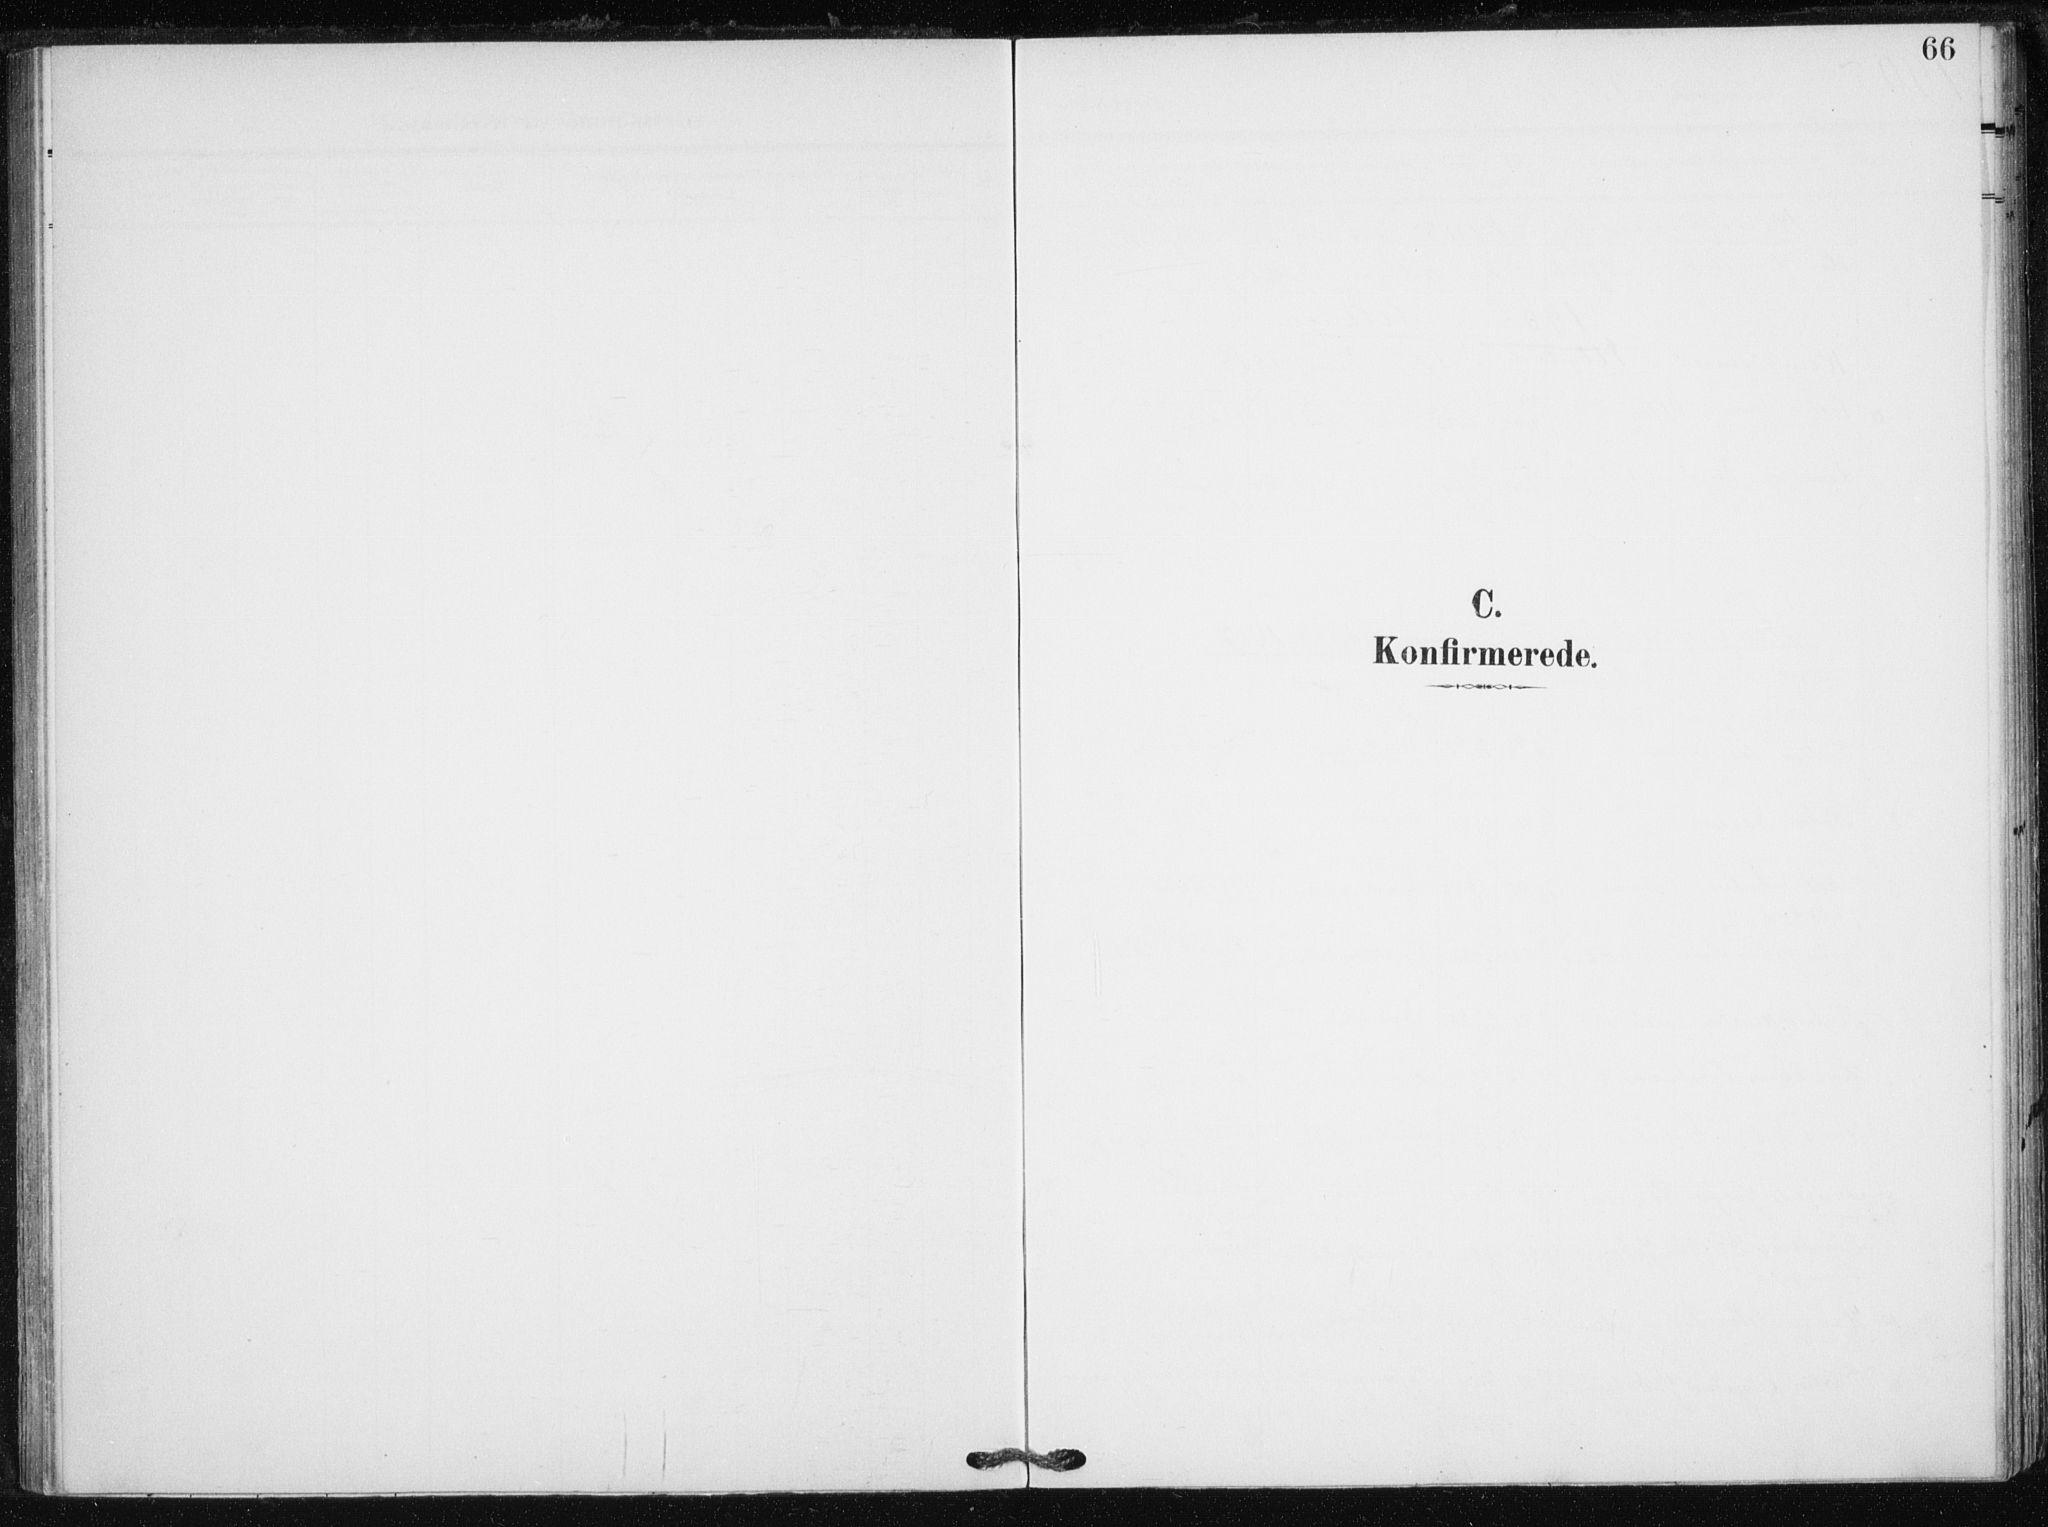 SATØ, Tranøy sokneprestkontor, I/Ia/Iaa/L0013kirke: Ministerialbok nr. 13, 1905-1922, s. 66